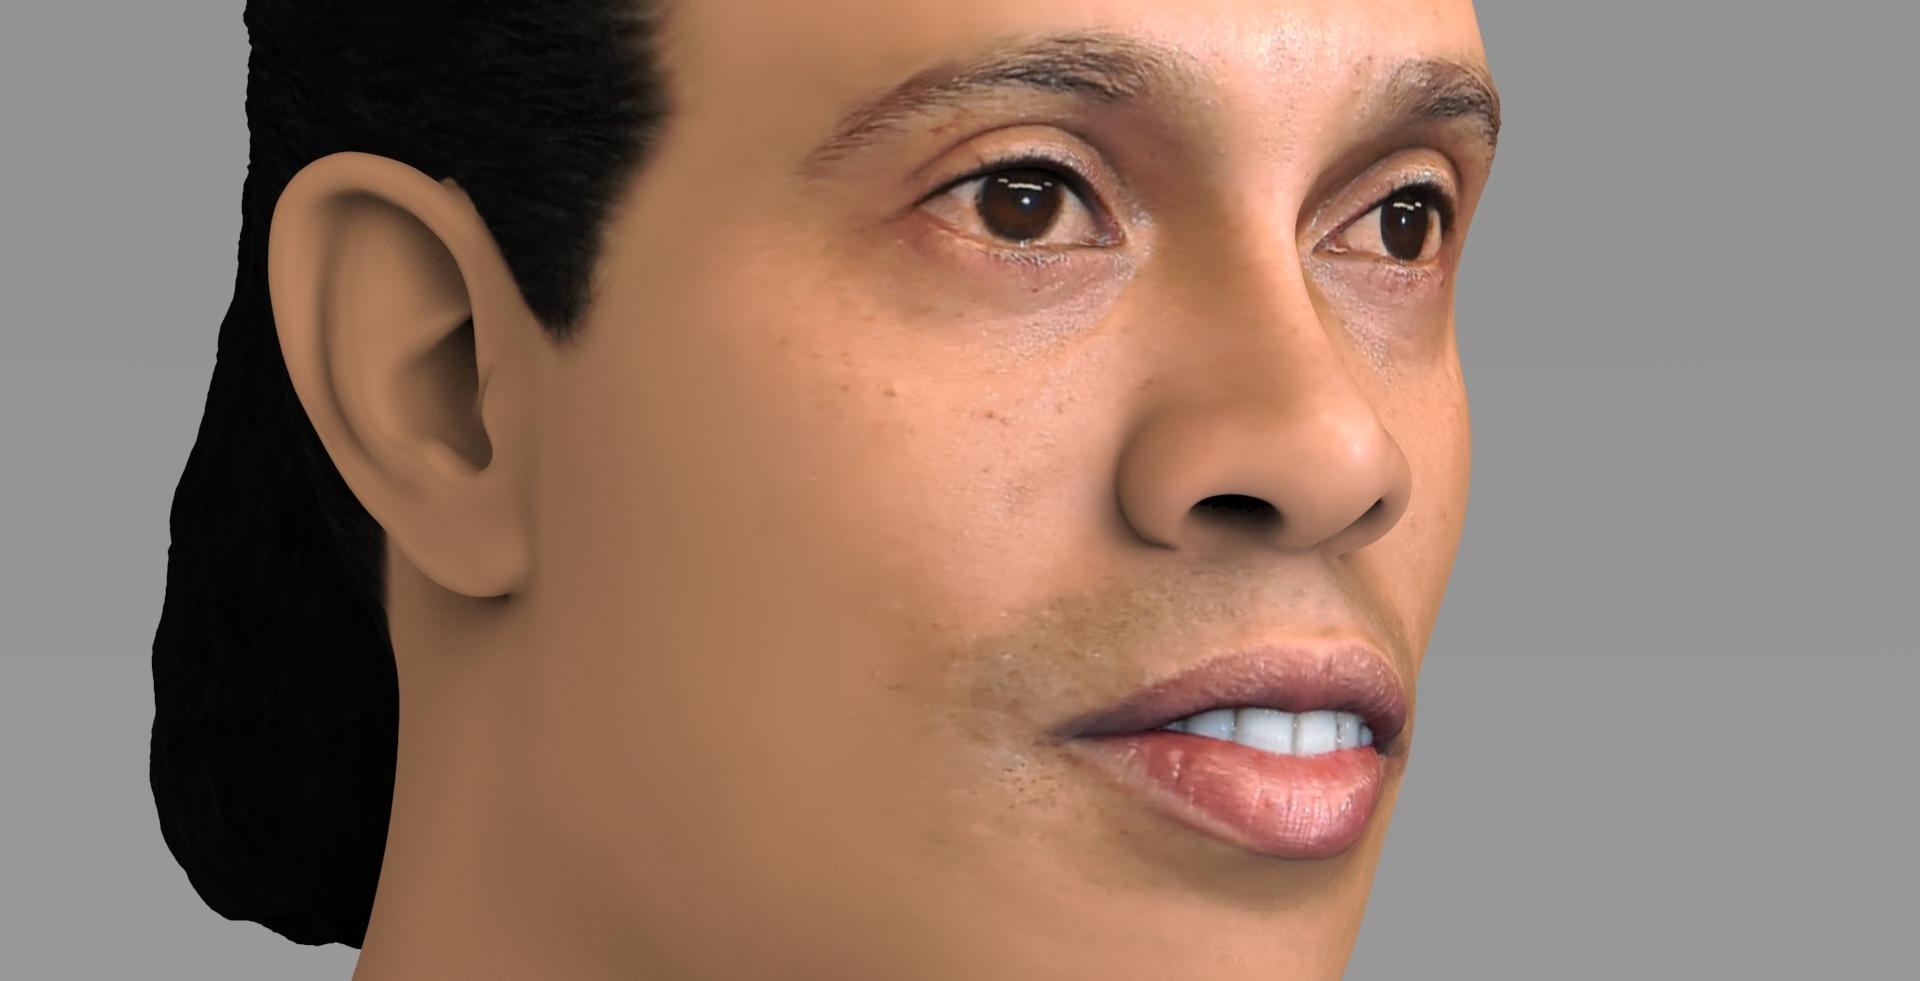 untitled.1689.jpg Download STL file Ronaldinho bust ready for full color 3D printing • 3D print model, PrintedReality